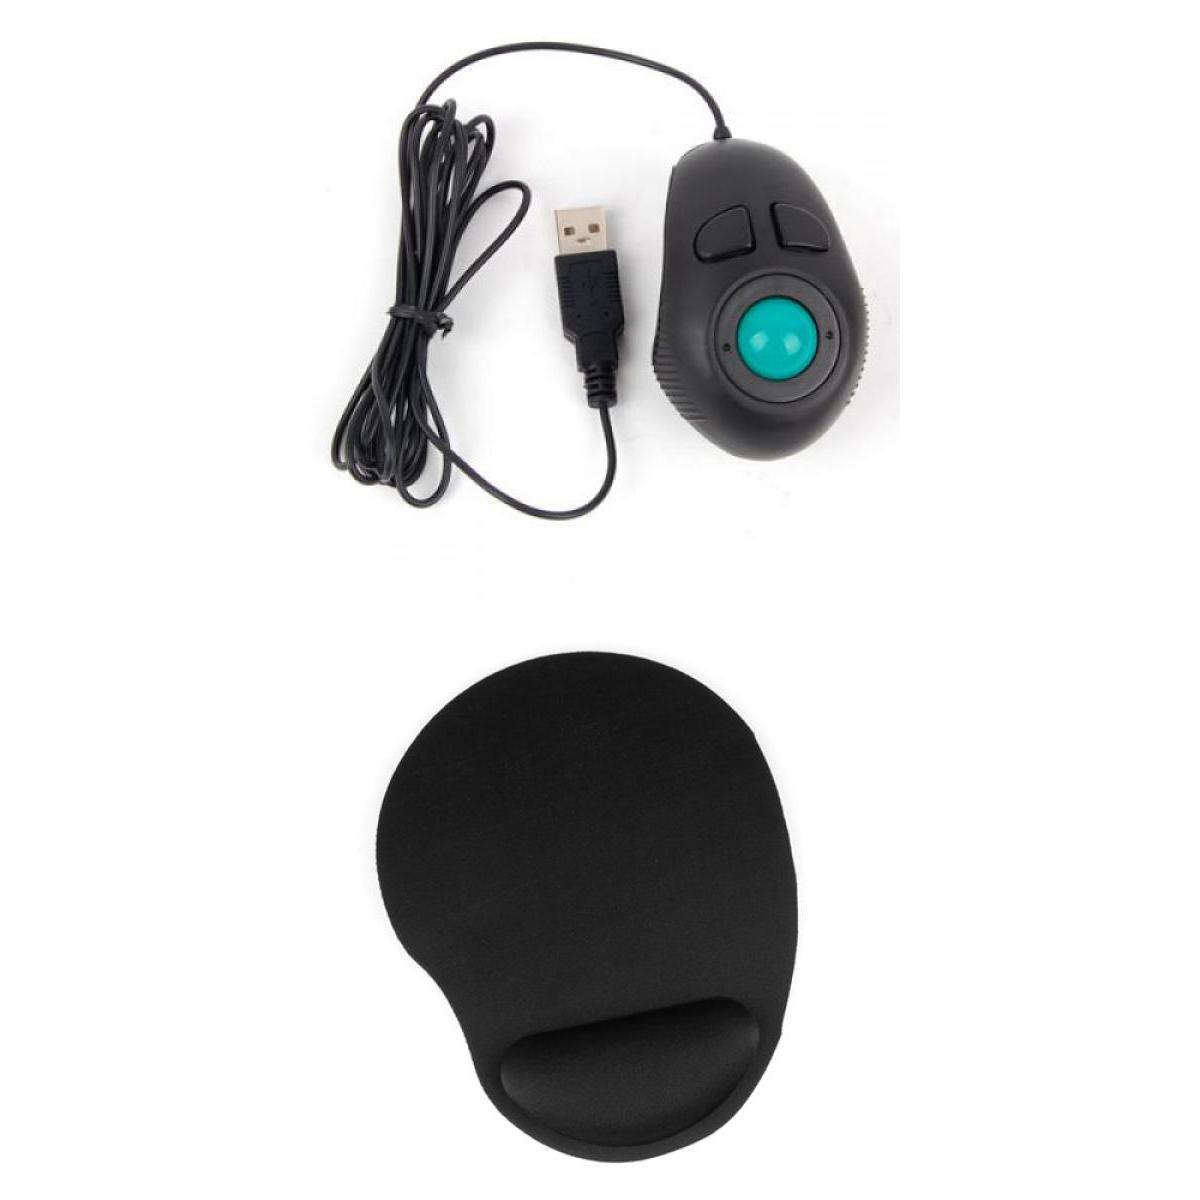 Portable Finger Hand Held 4D Usb Mini Trackball Mouse+ Wrist Rest Mouse Mat